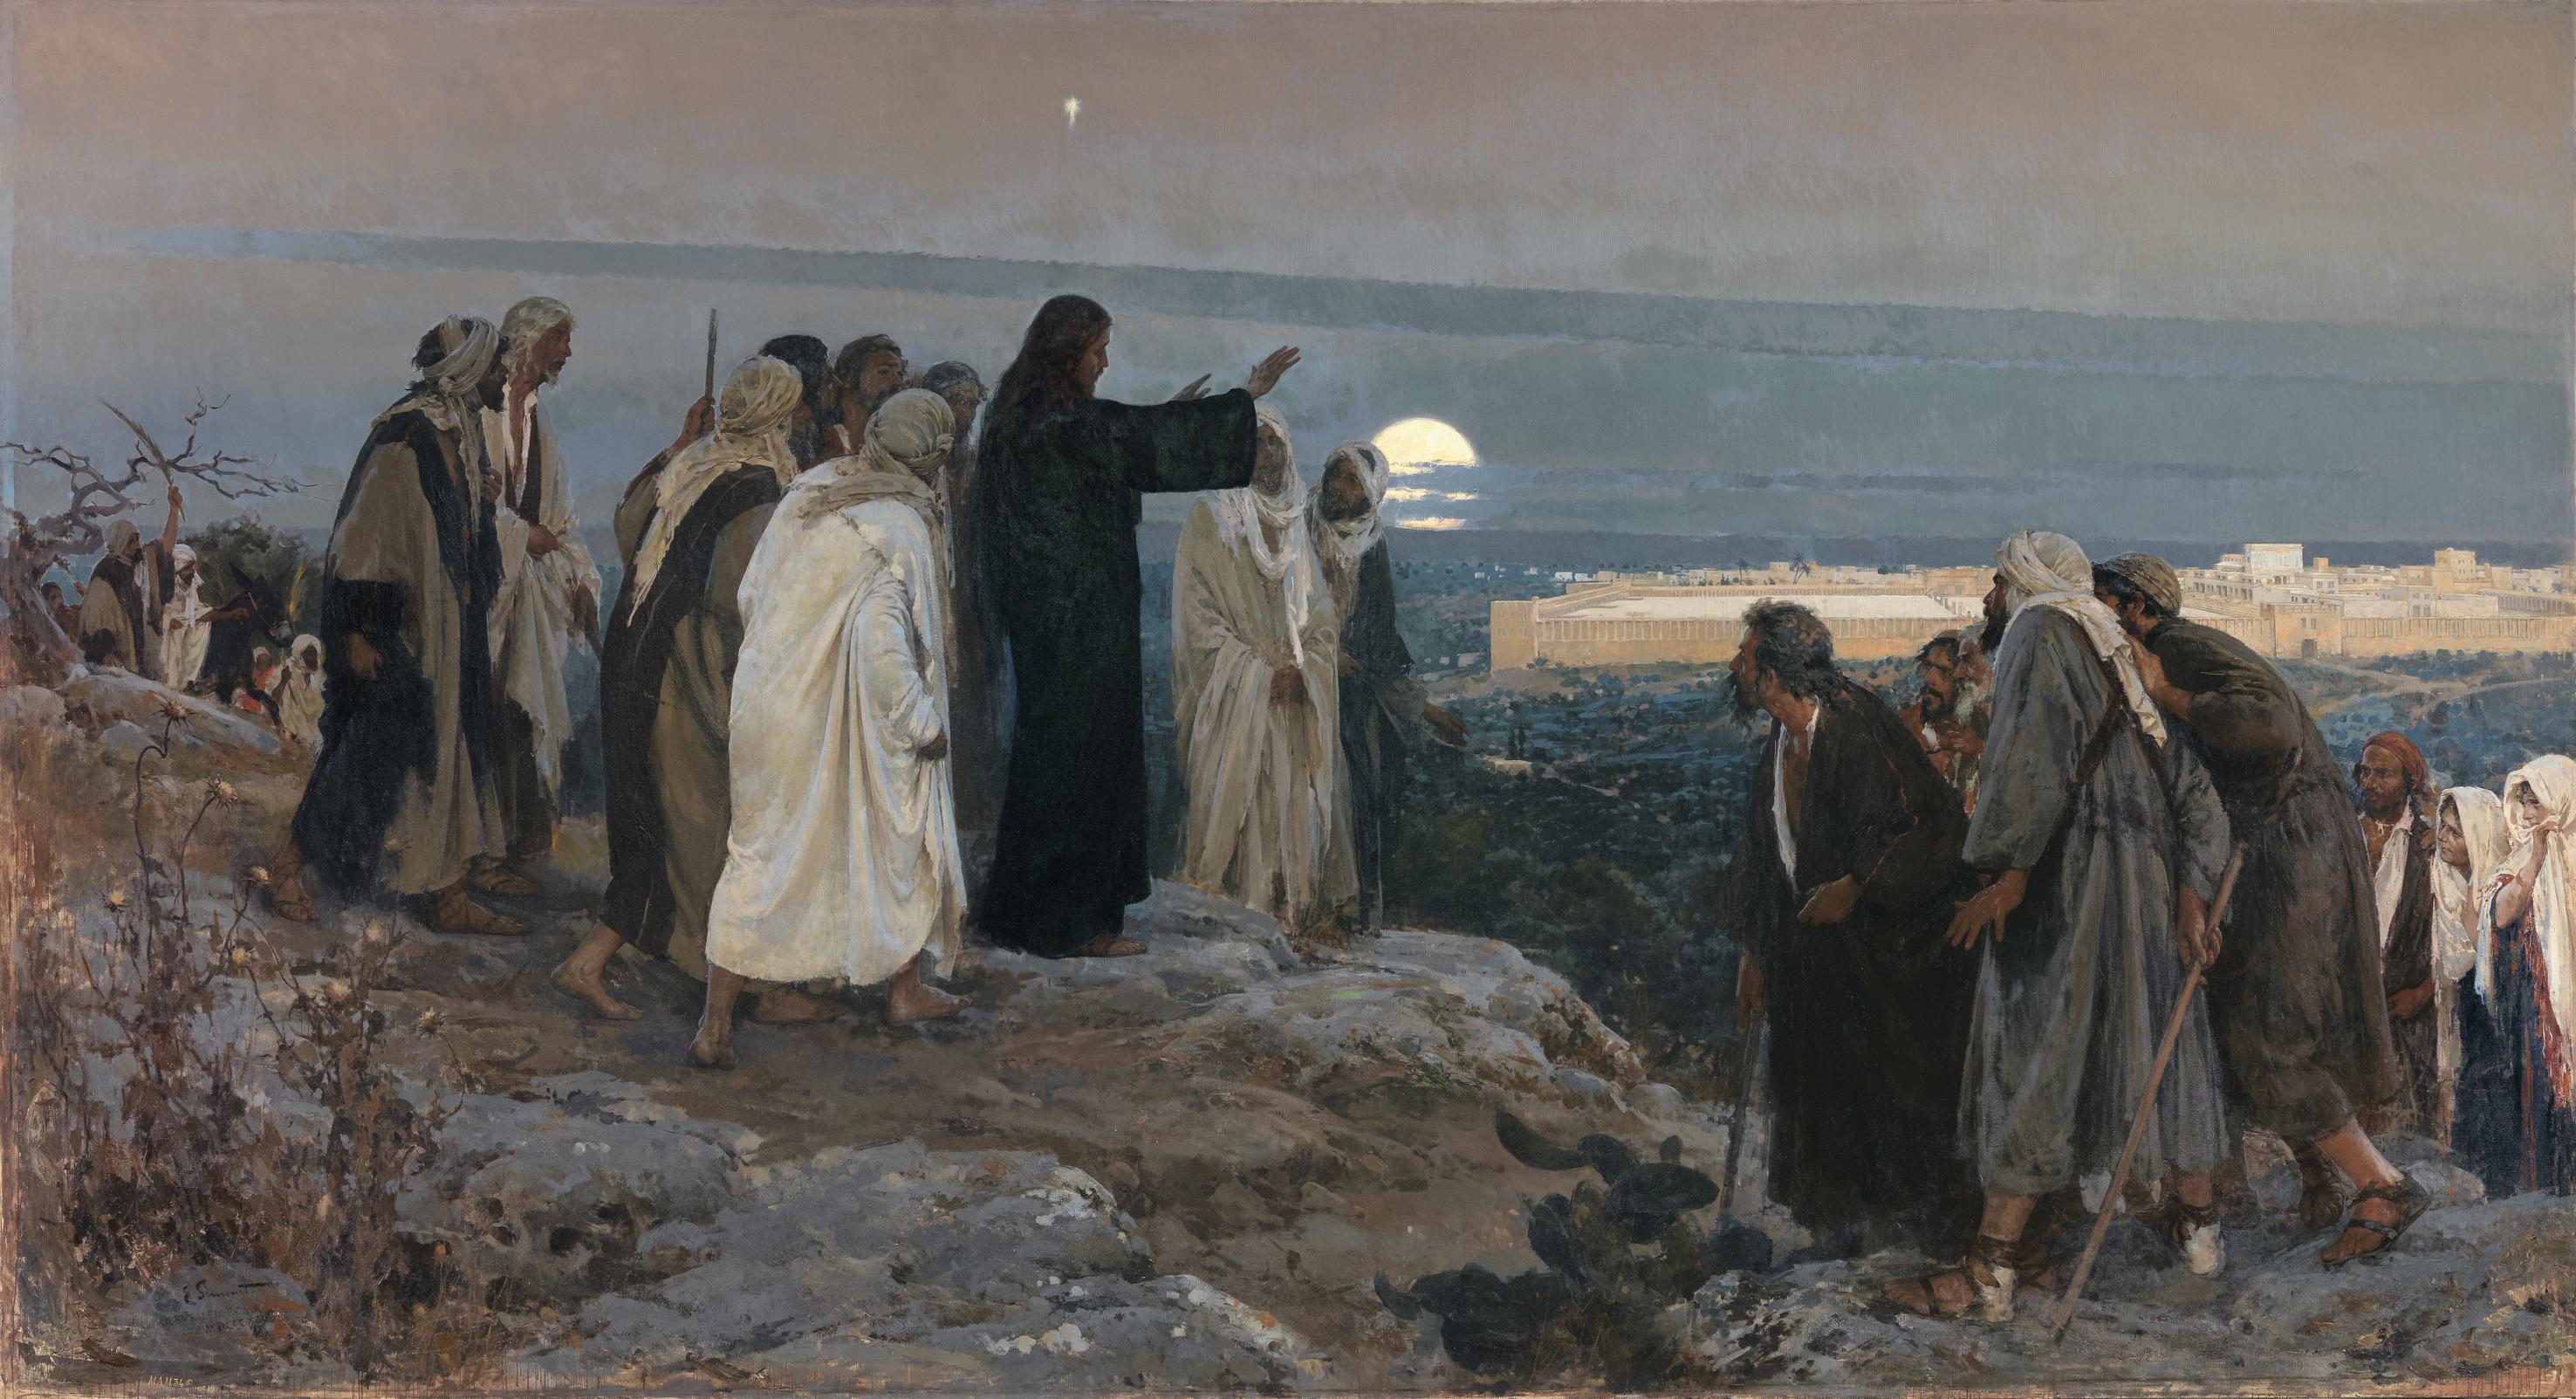 Jezus verke jo Enrique_Simonet_-_Flevit_super_illam_1892